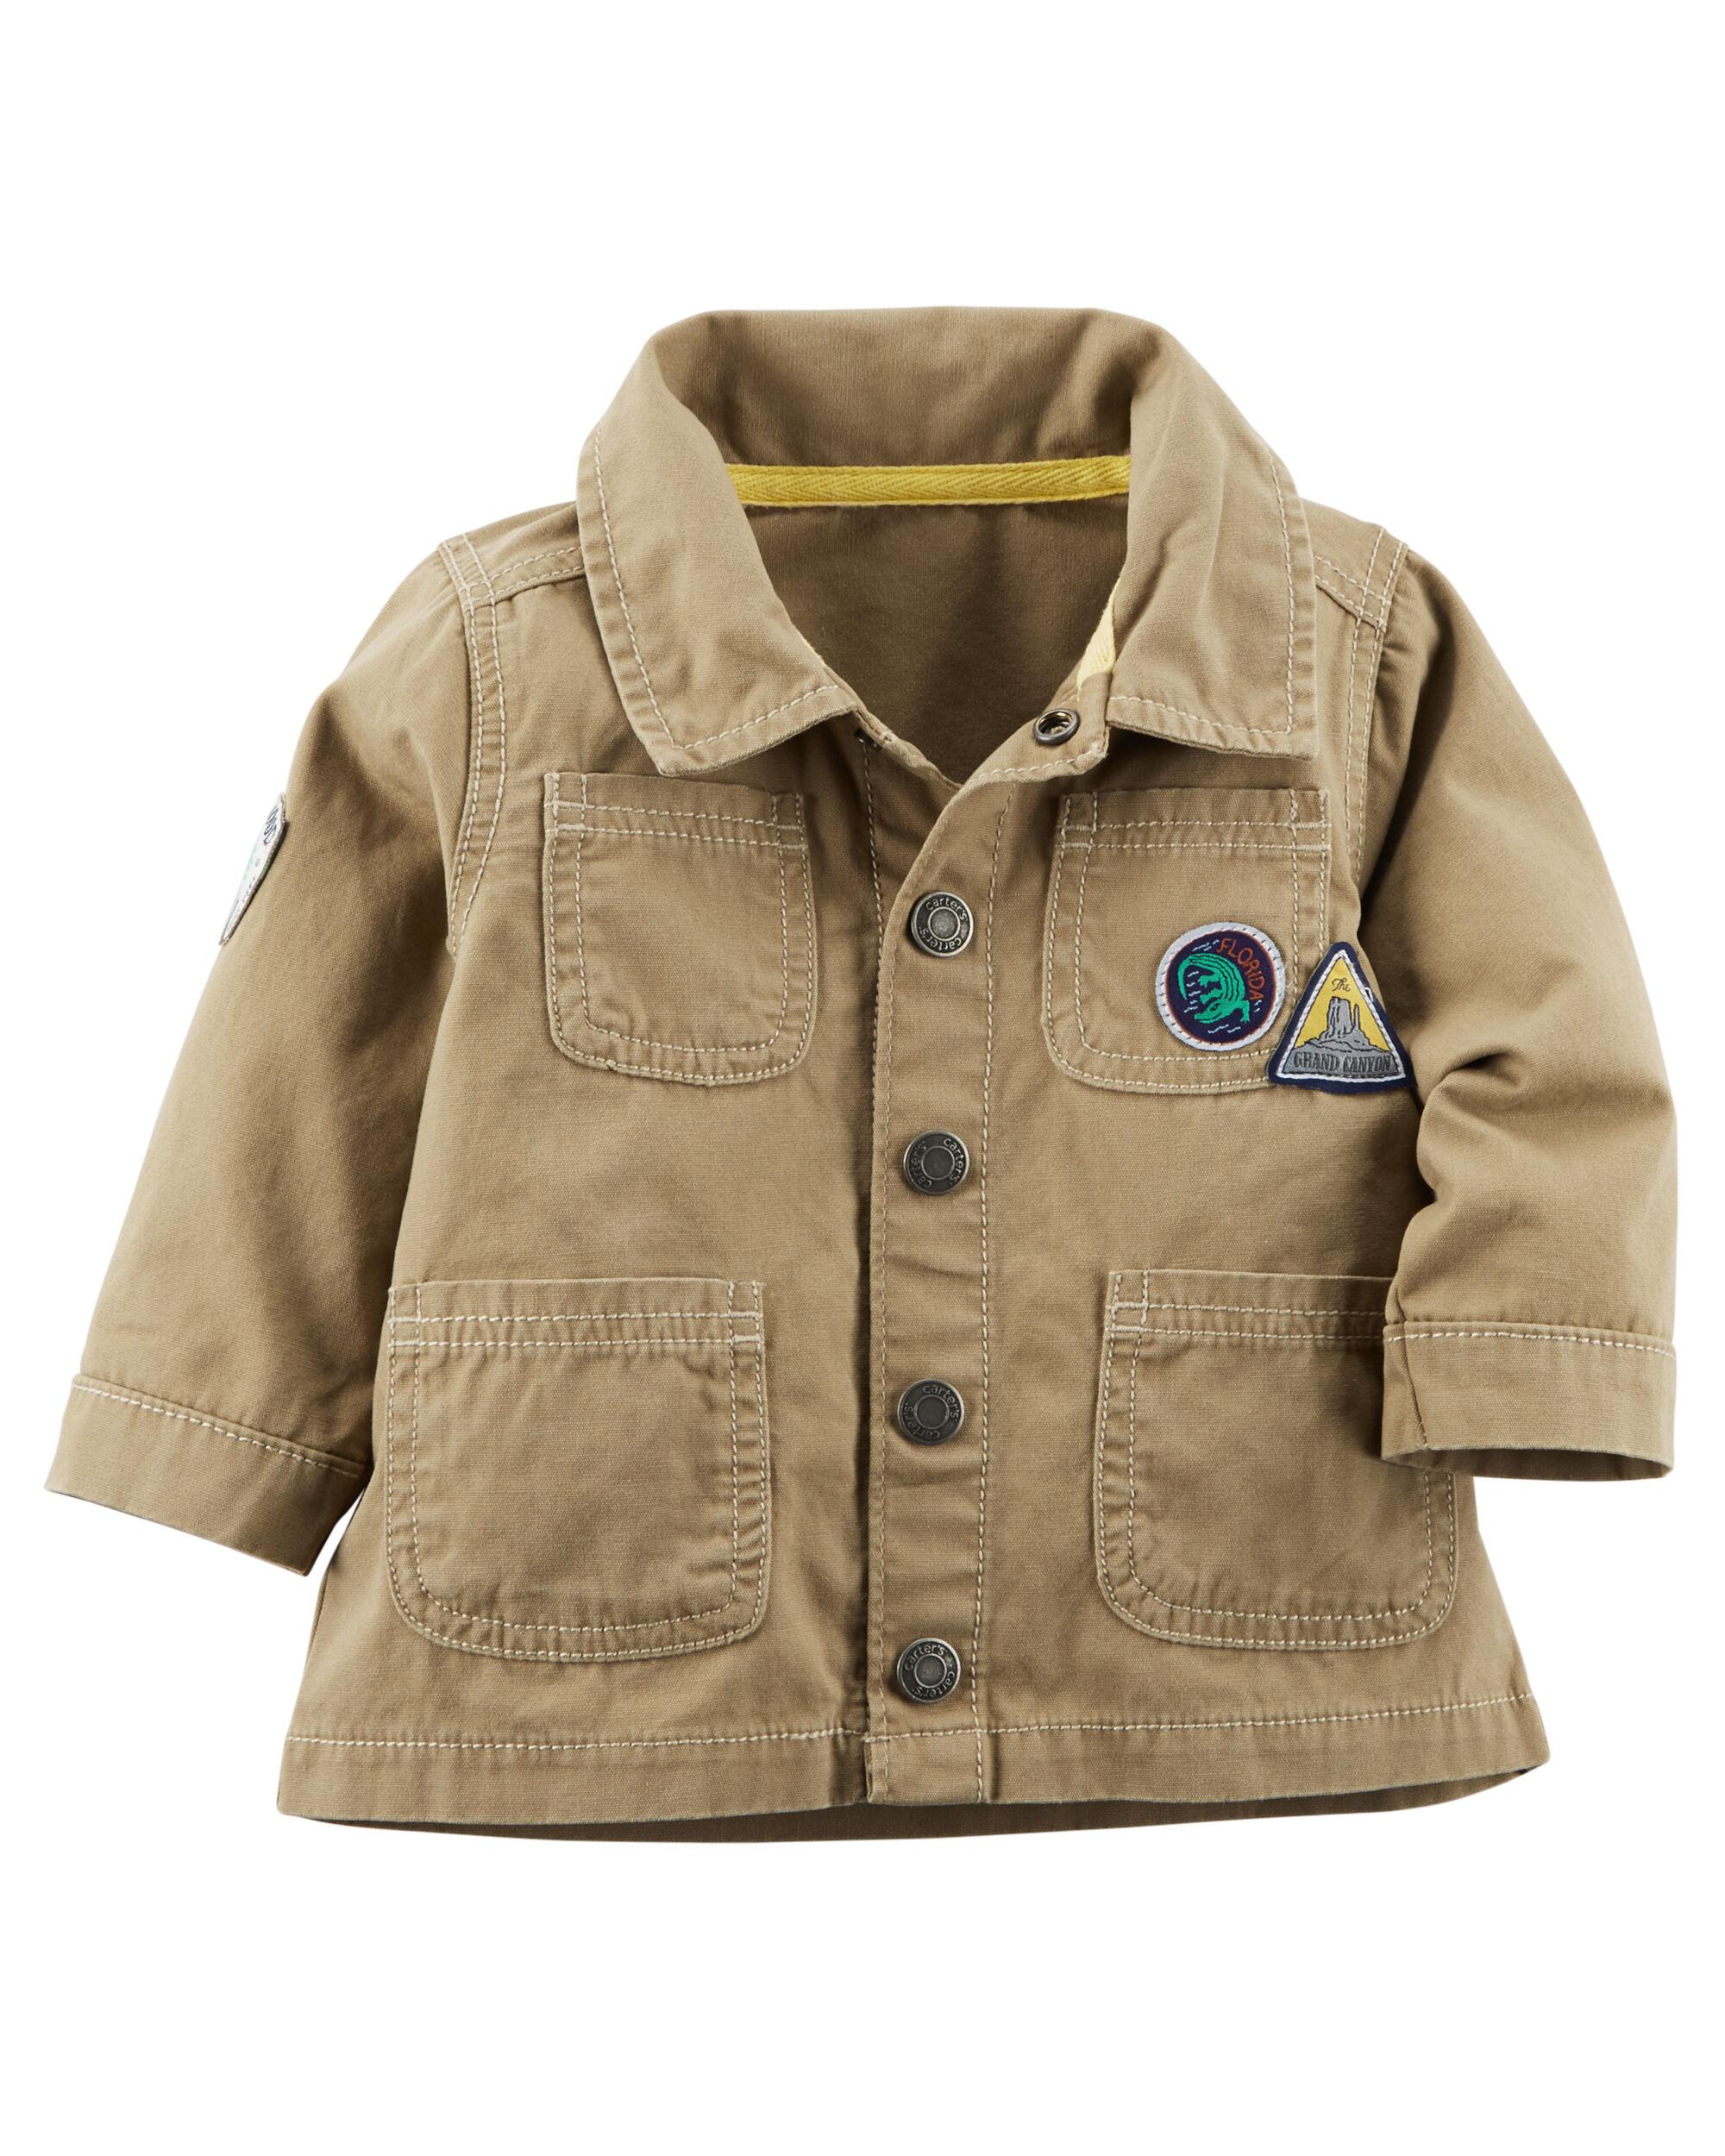 Carters Baby Boys Canvas Jacket